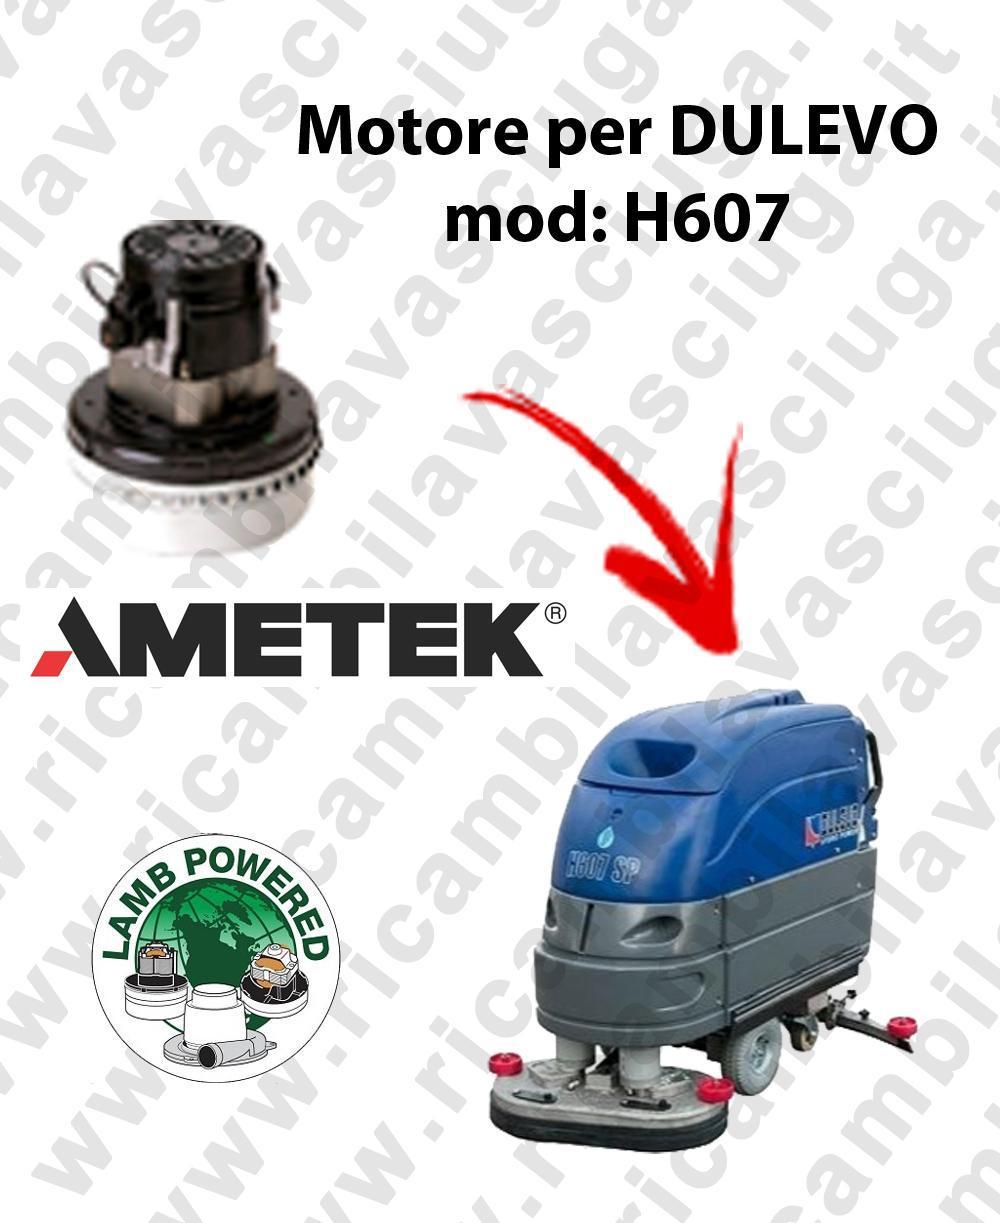 H607 Saugmotor LAMB AMETEK für scheuersaugmaschinen DULEVO